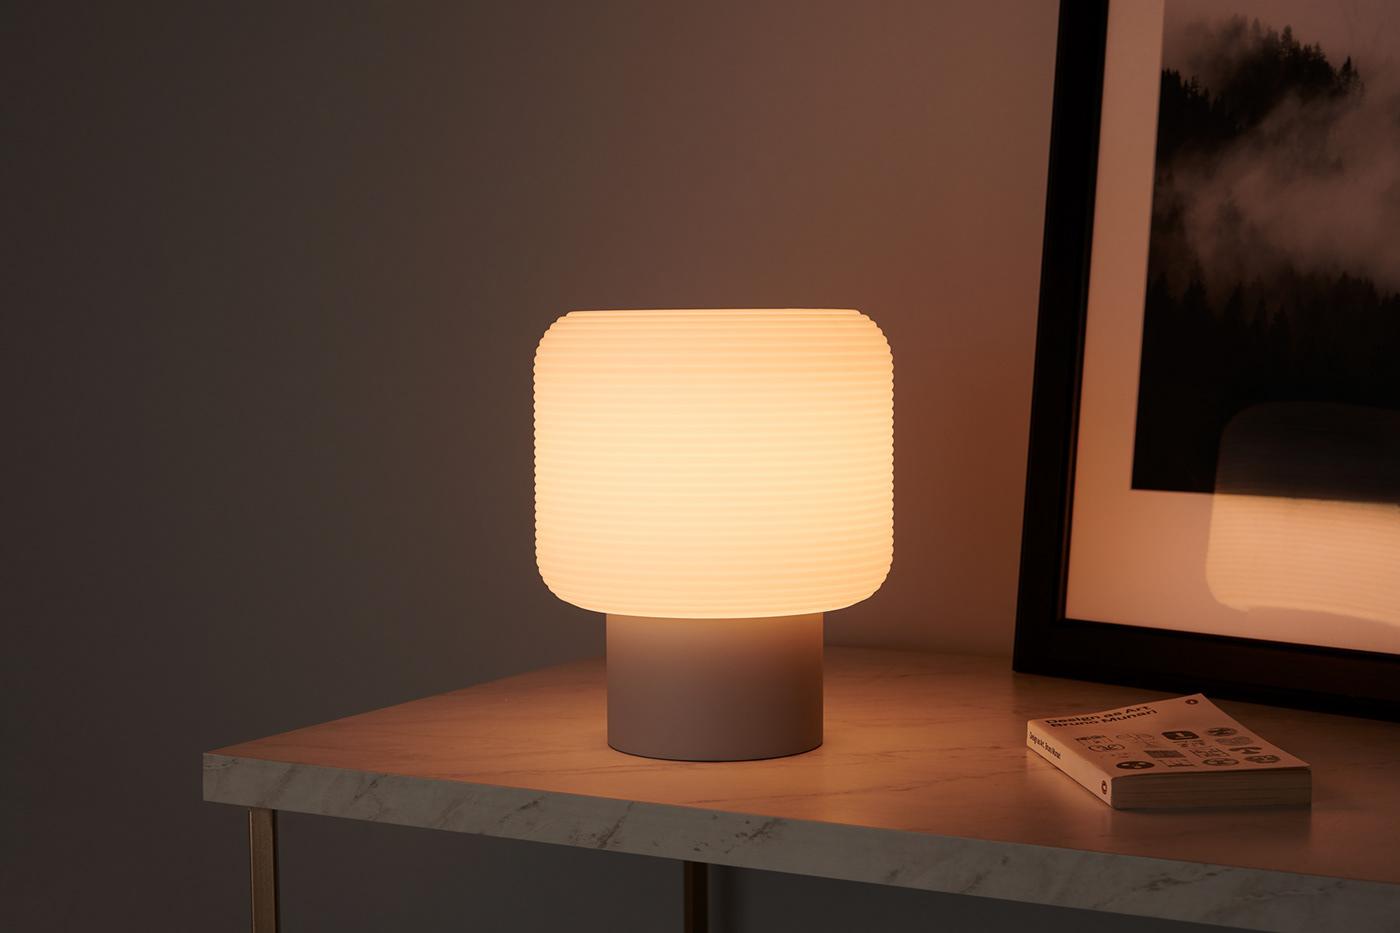 Lamp 3dprint light product gantri lampara lighting luz maskor